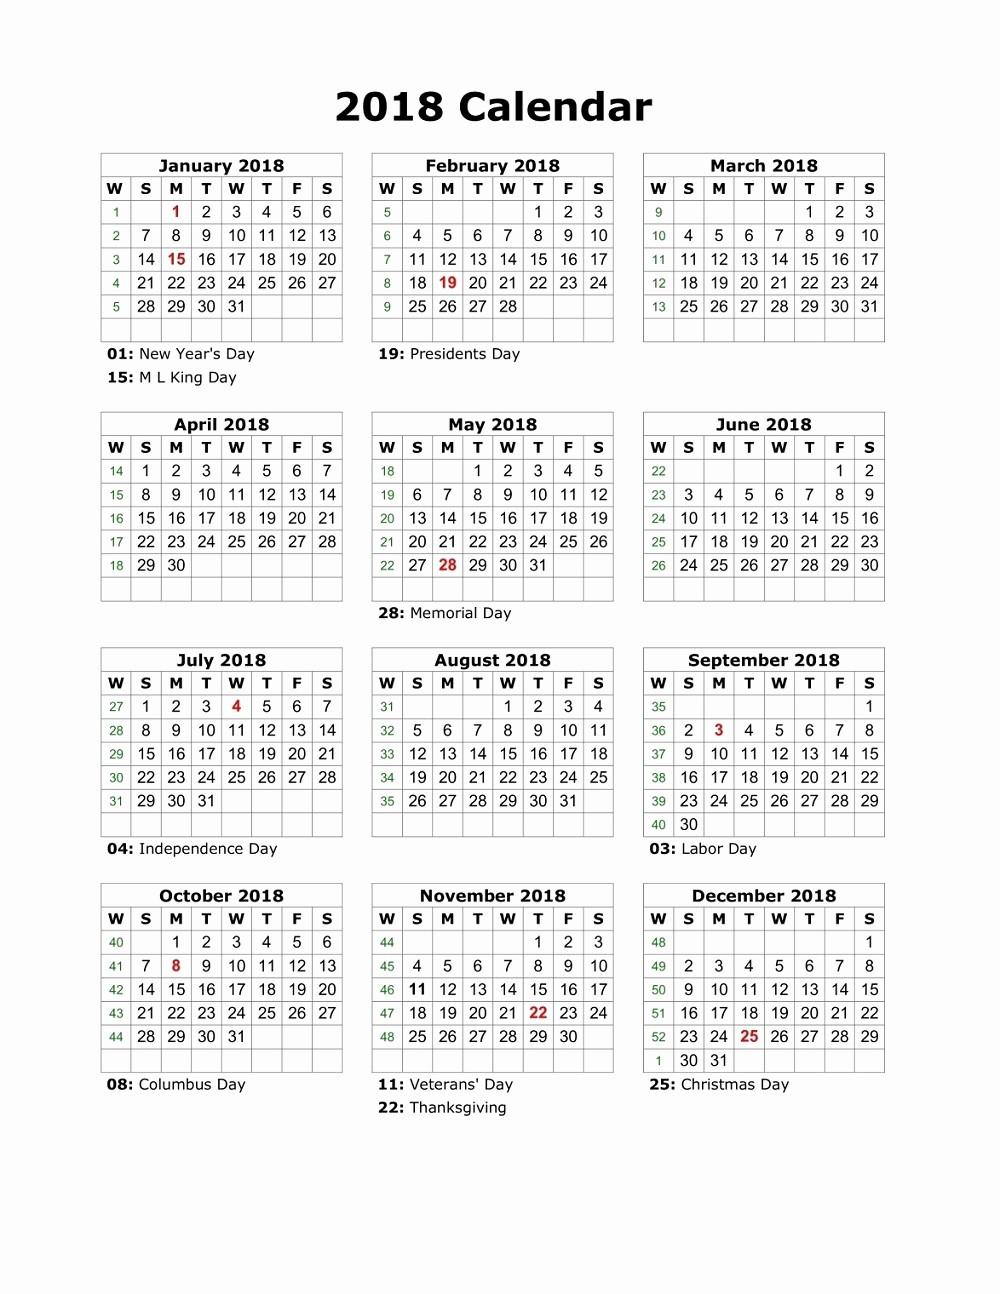 Free Printable Yearly Calendar 2018 Lovely 2018 Printable Calendar Year Free